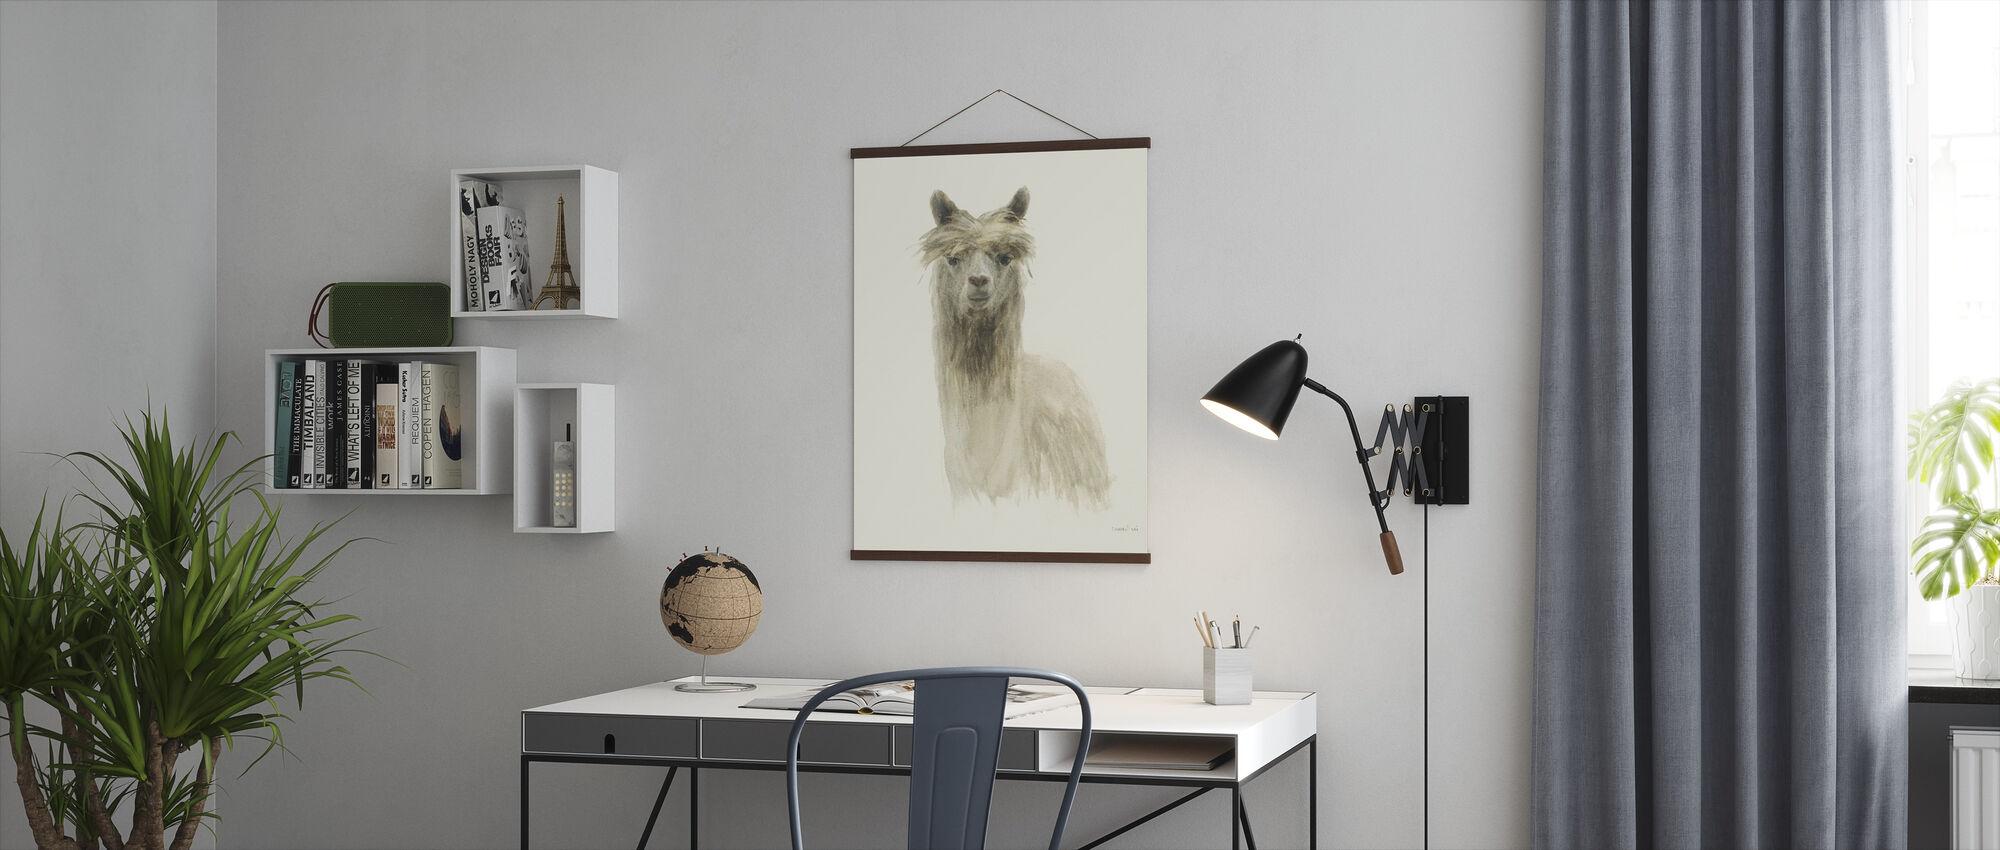 Classic Llamas I - Poster - Office